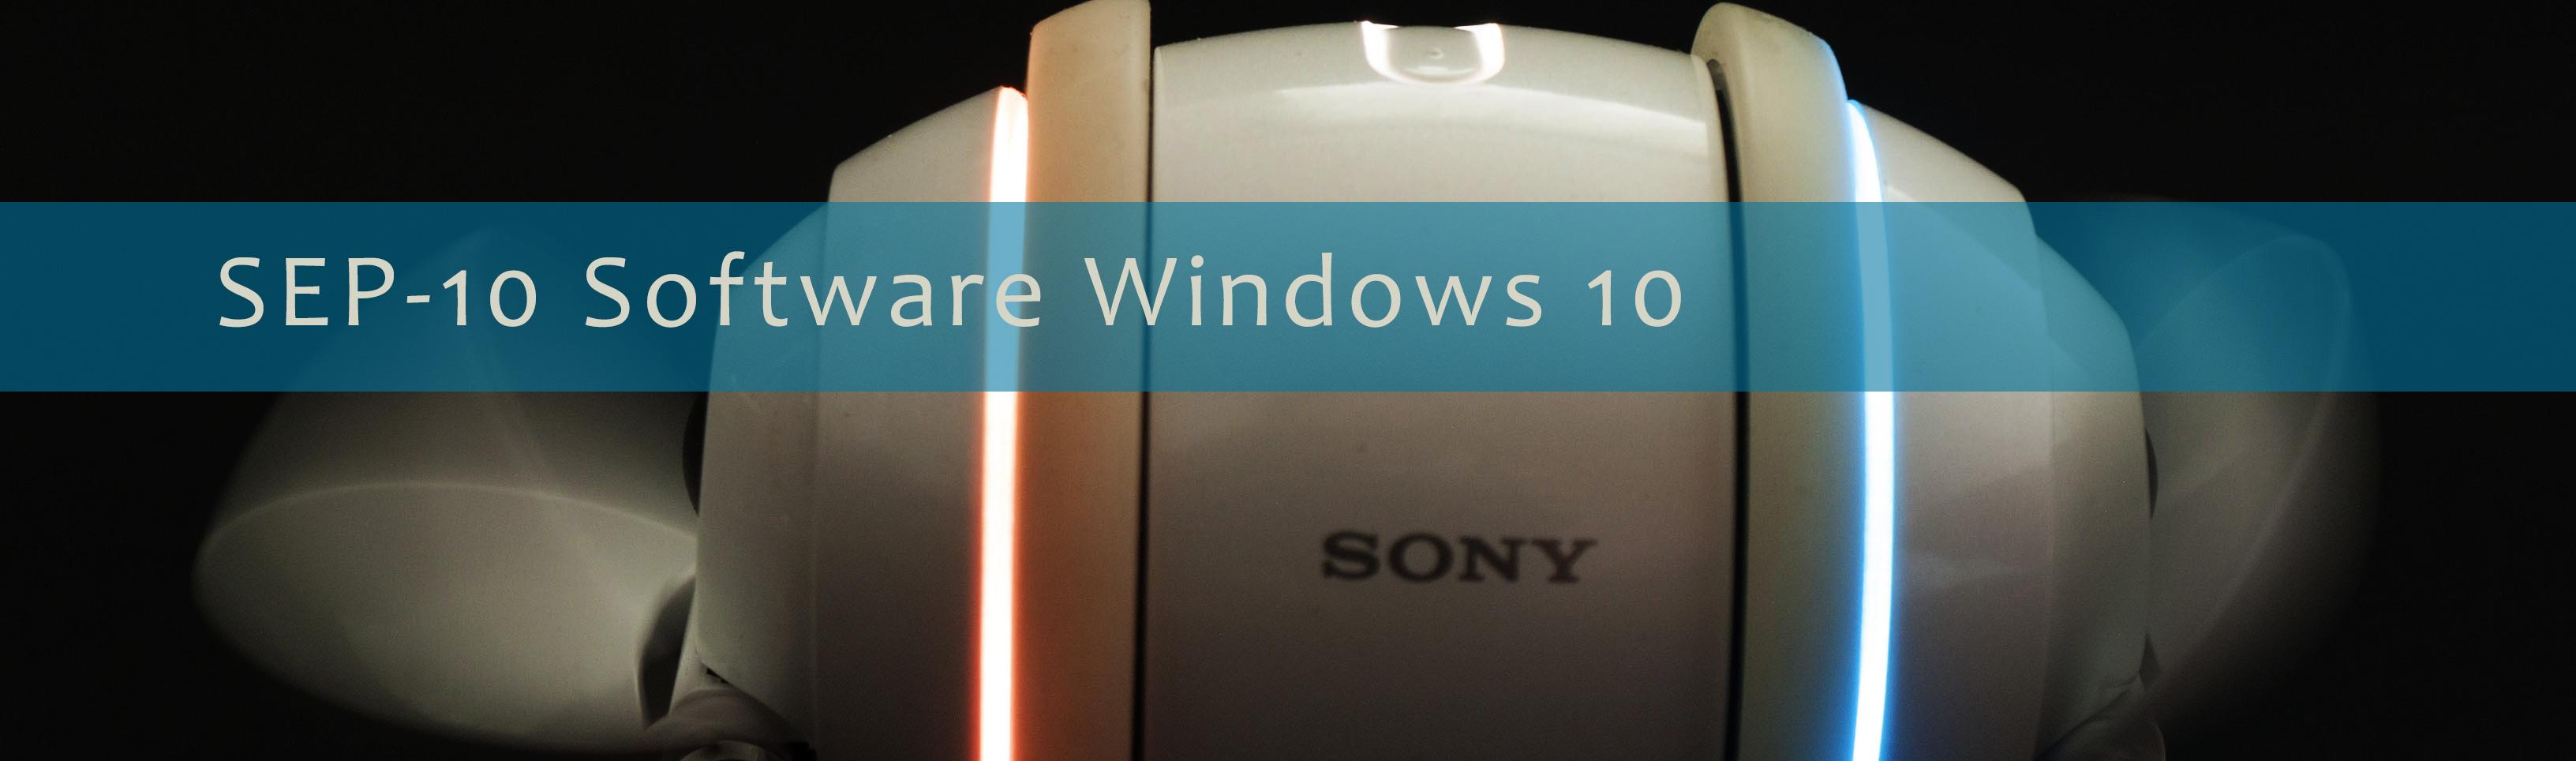 Sonicstage windows 10